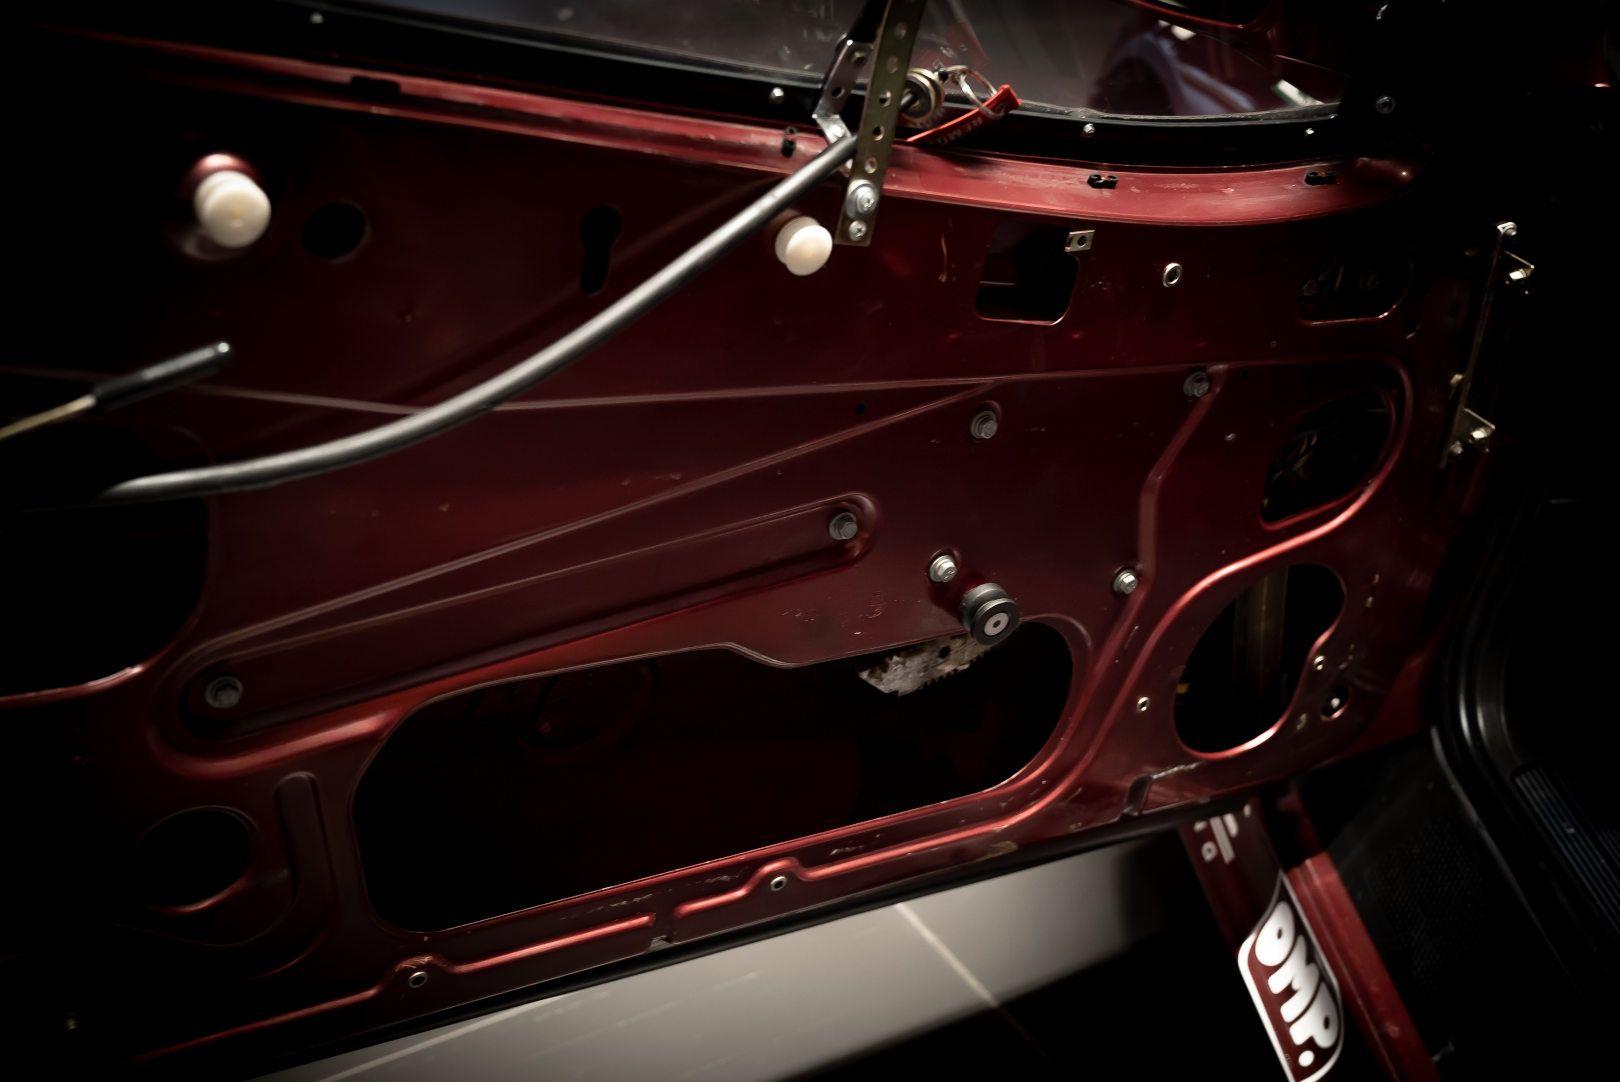 1995 Alfa Romeo GTV 2.0 V6 Turbo Cup Replica 57190